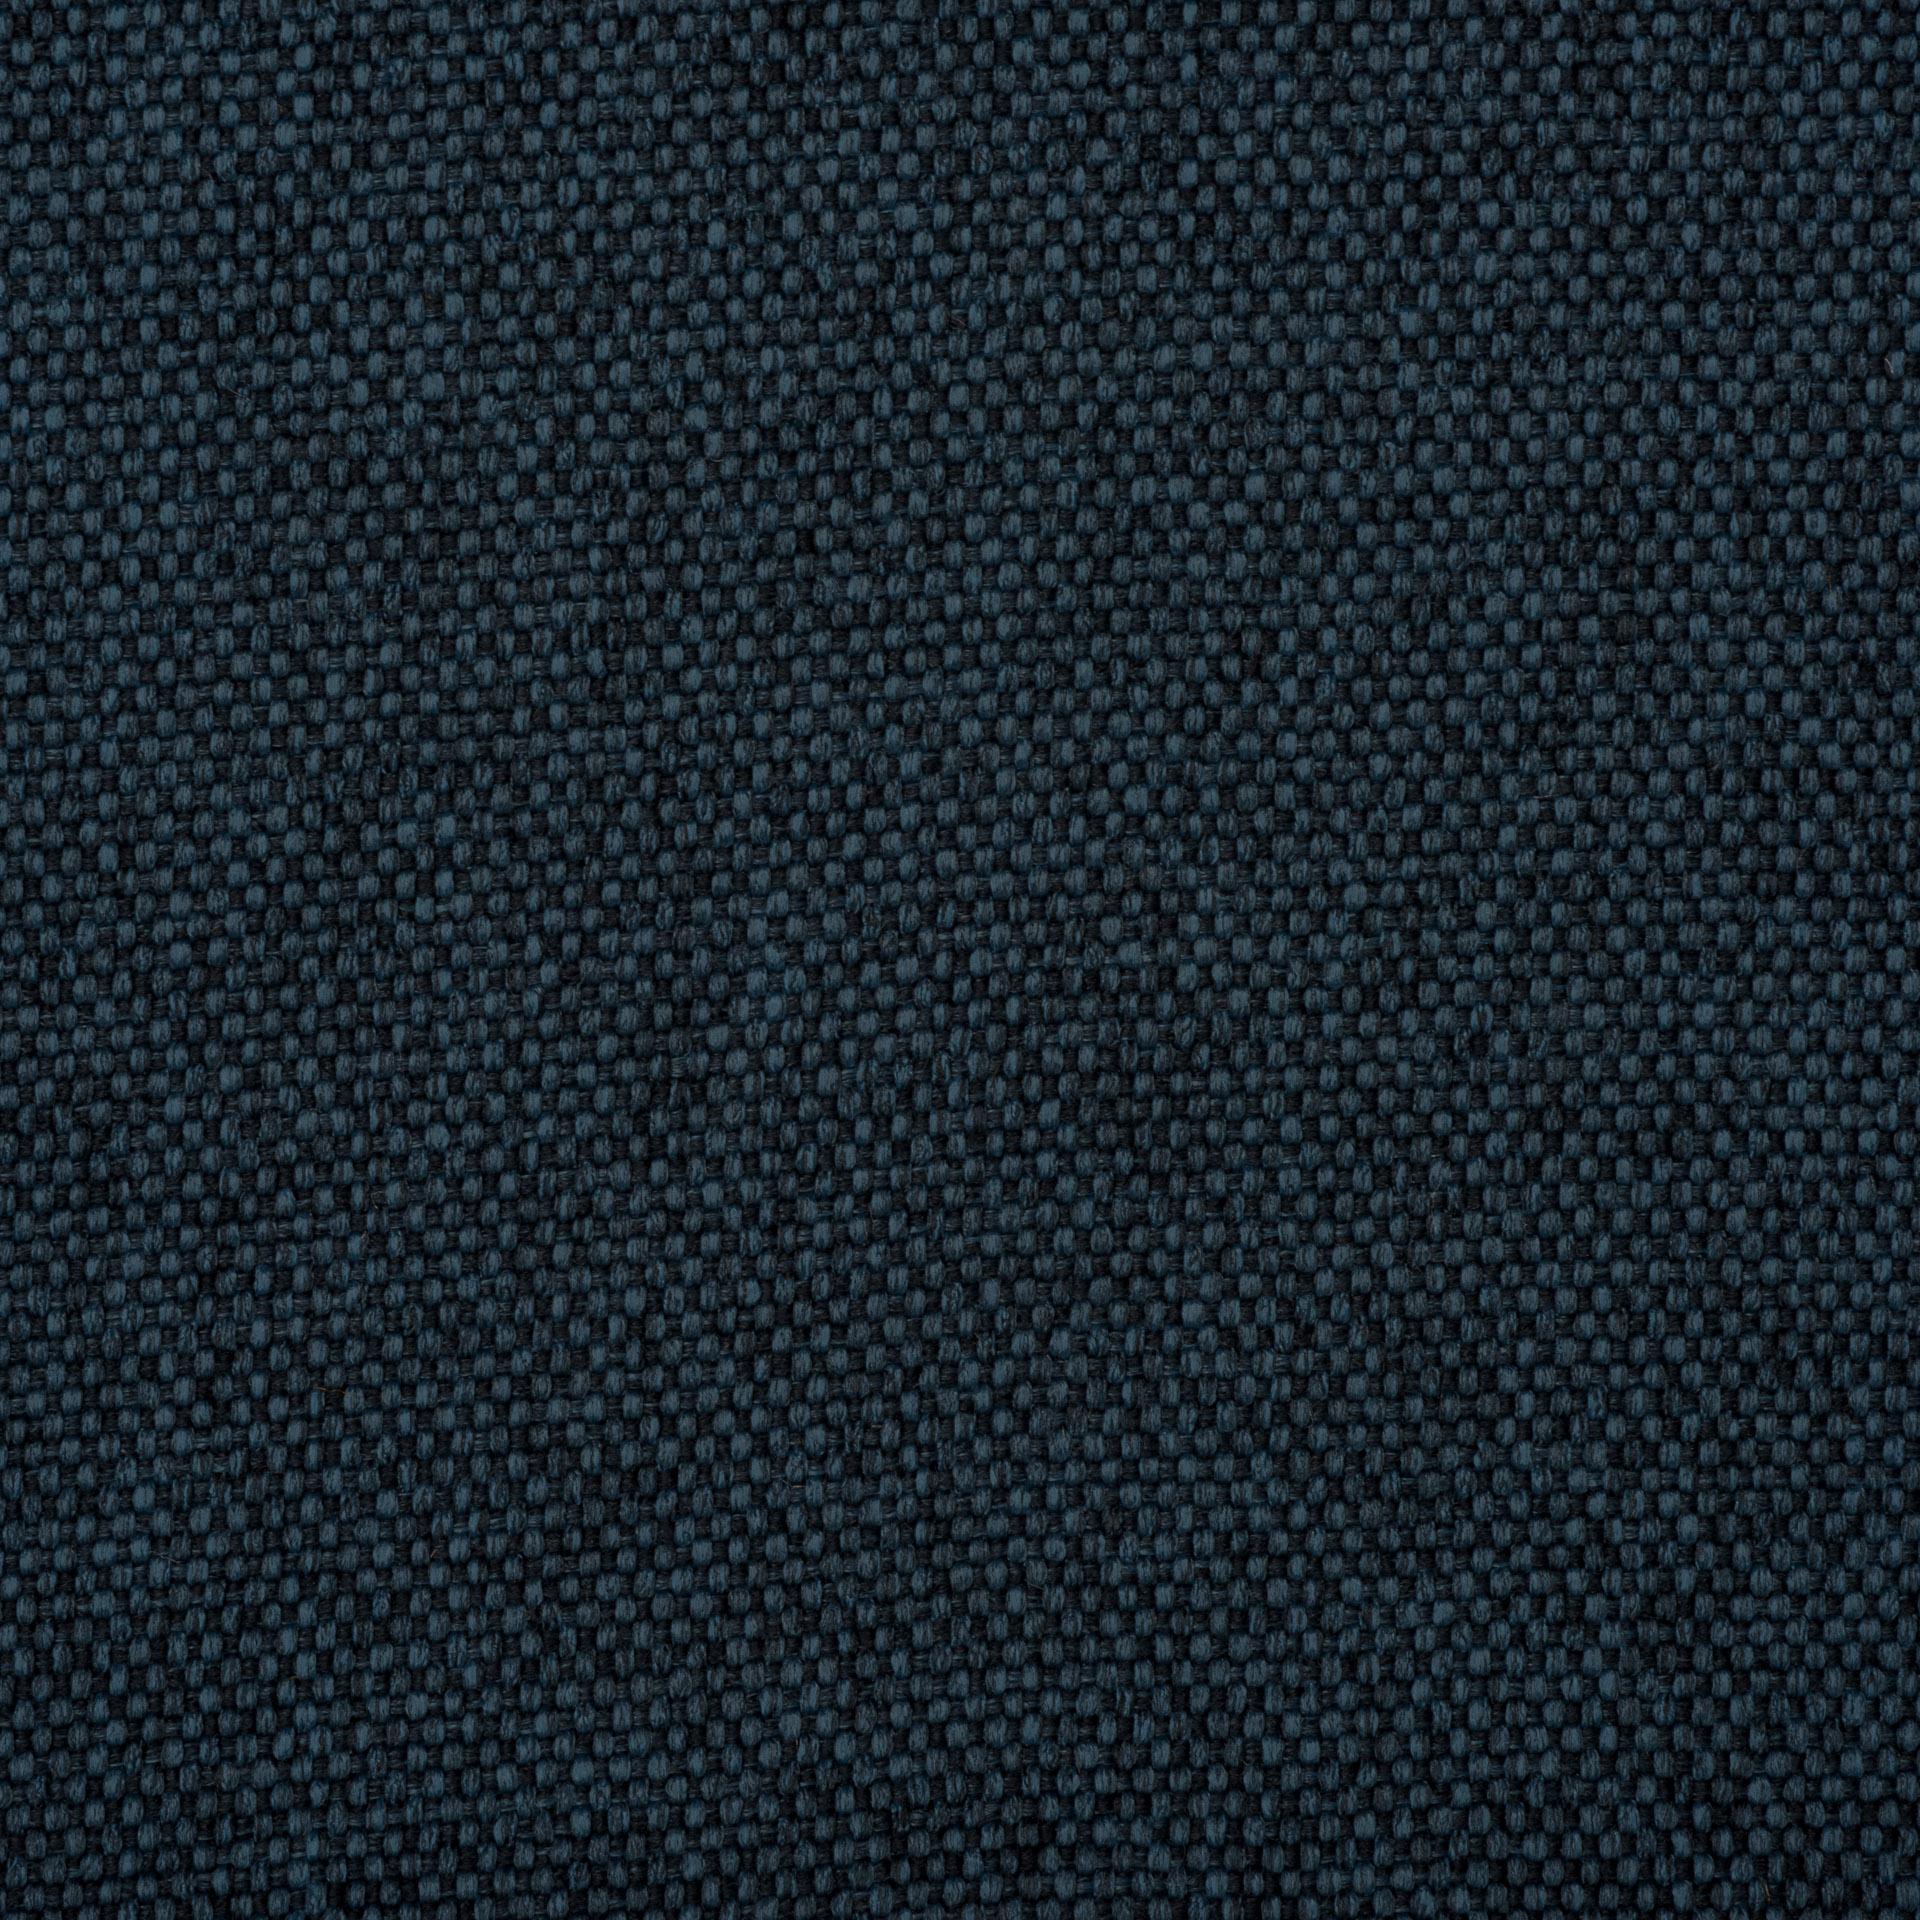 Коллекция ткани Багама 30 Jeans New,  купить ткань Жаккард для мебели Украина